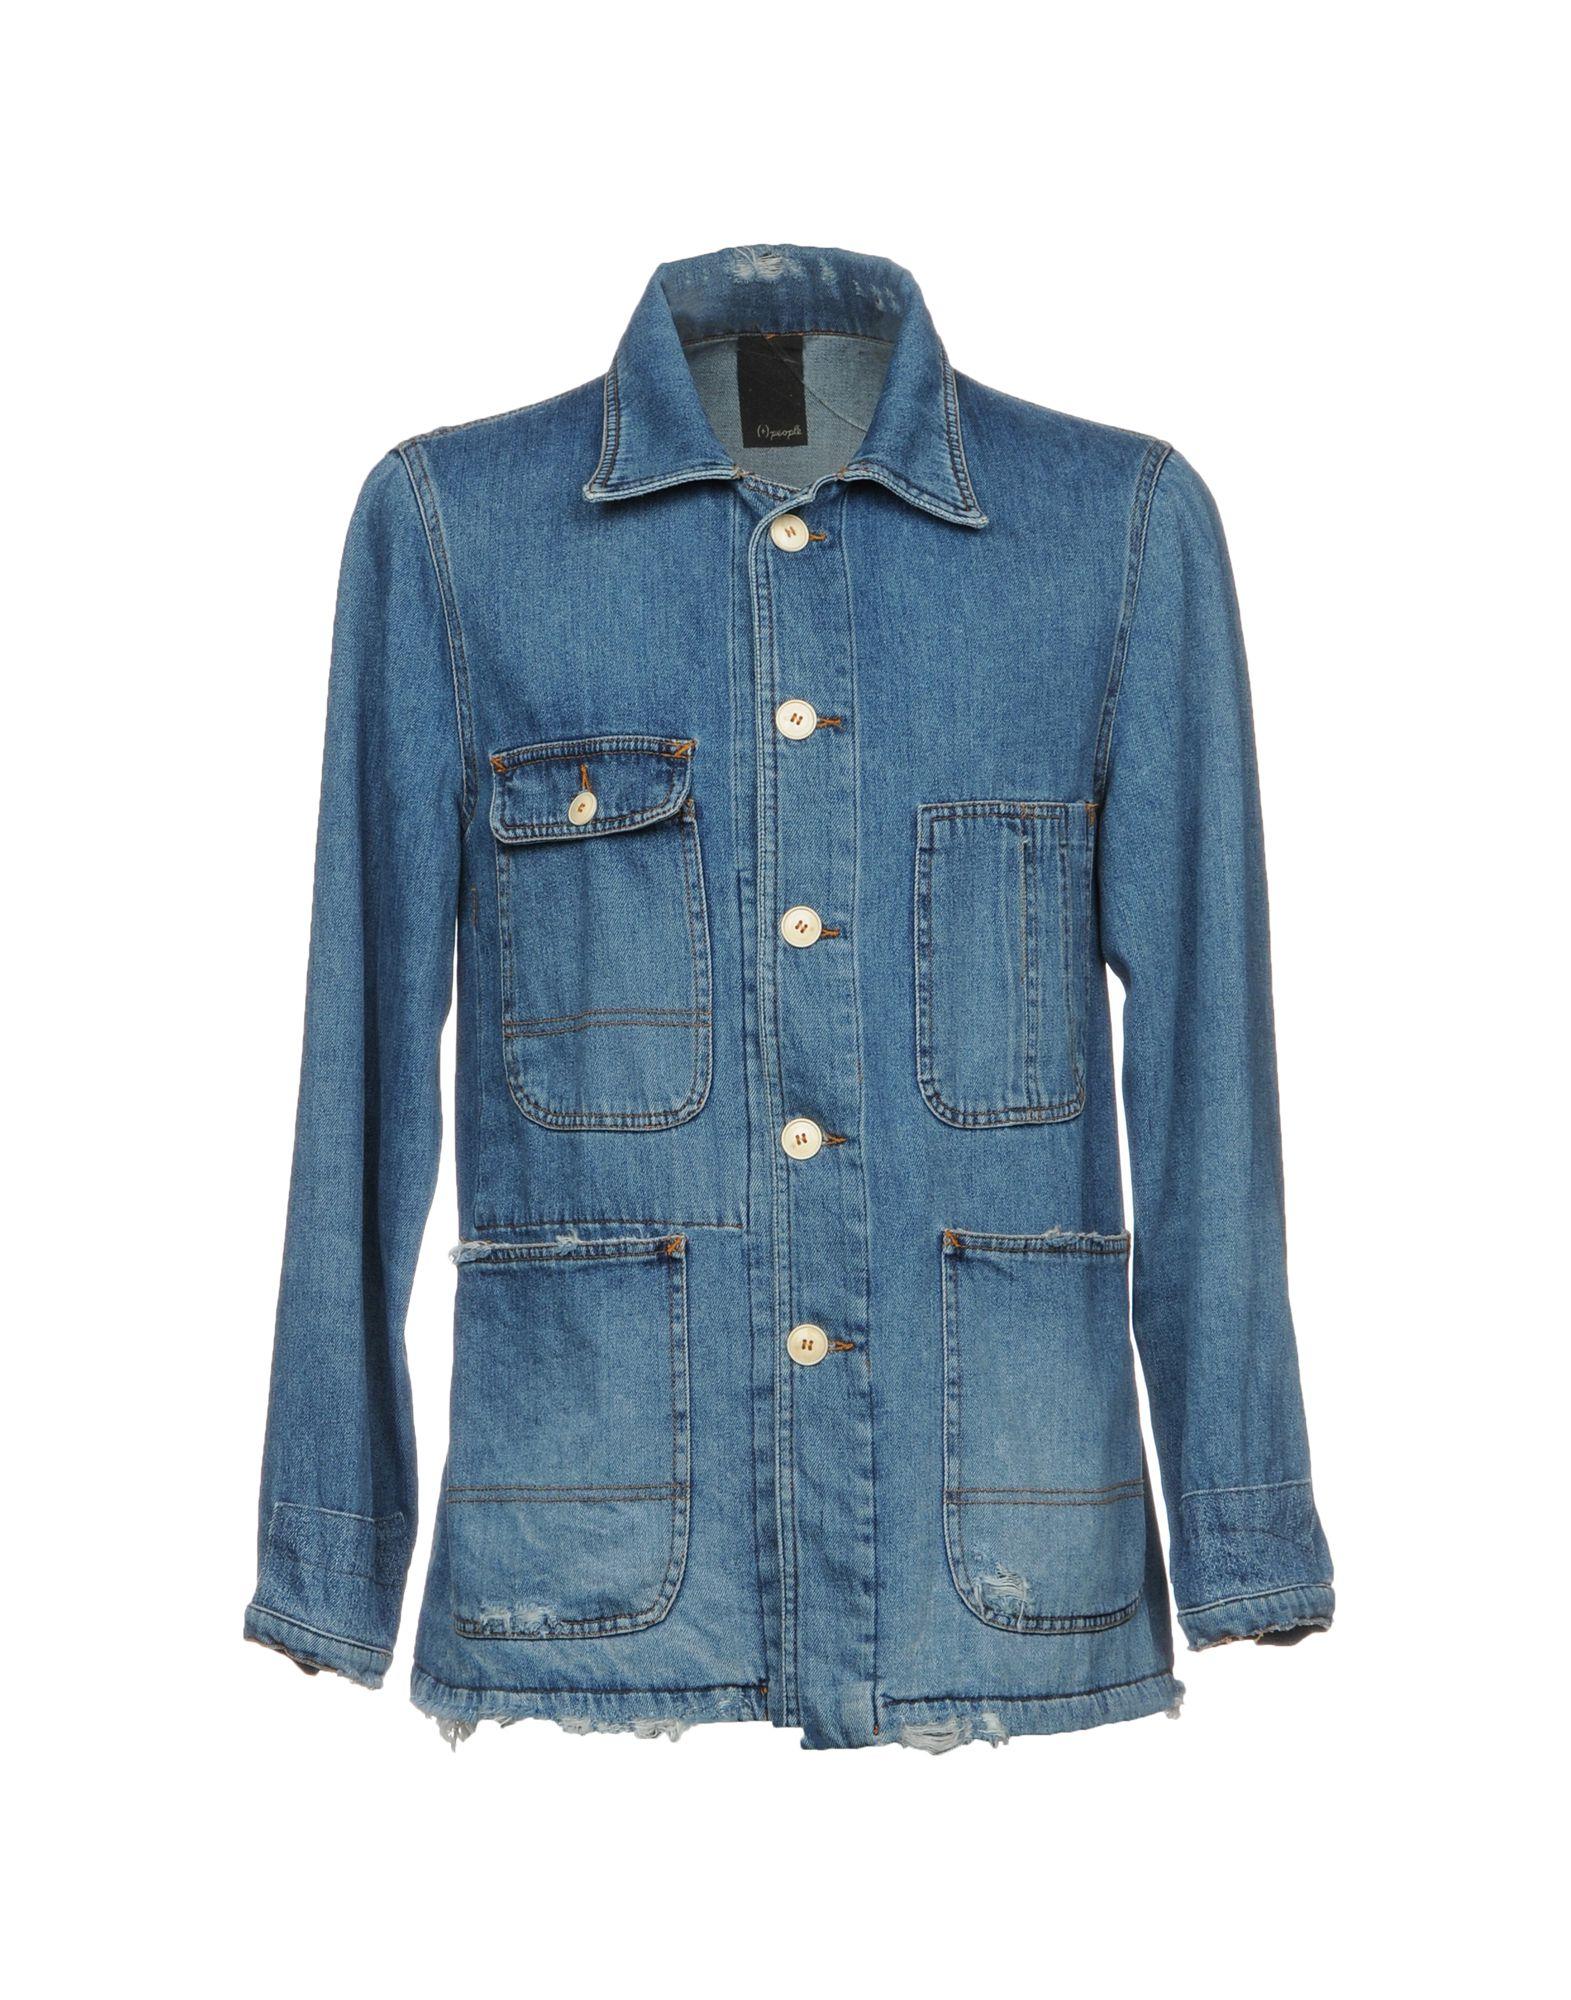 Giubbotto Jeans (+) People Uomo - Acquista online su